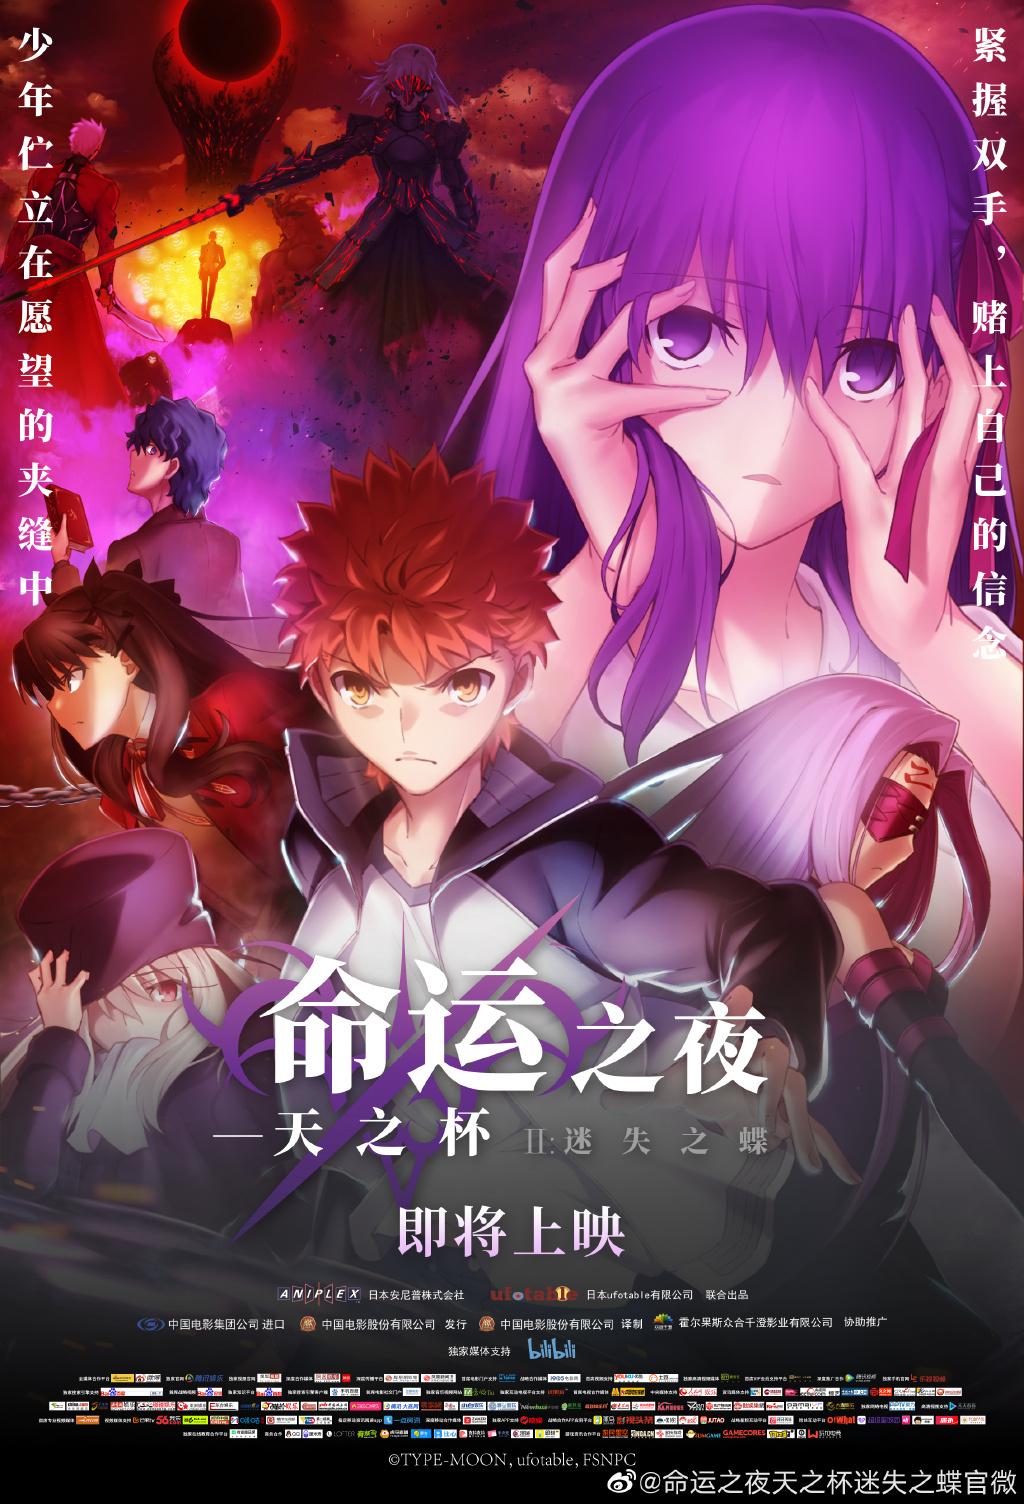 Fate2将引进内地  《天之杯2:迷失之蝶》 中文海报发布